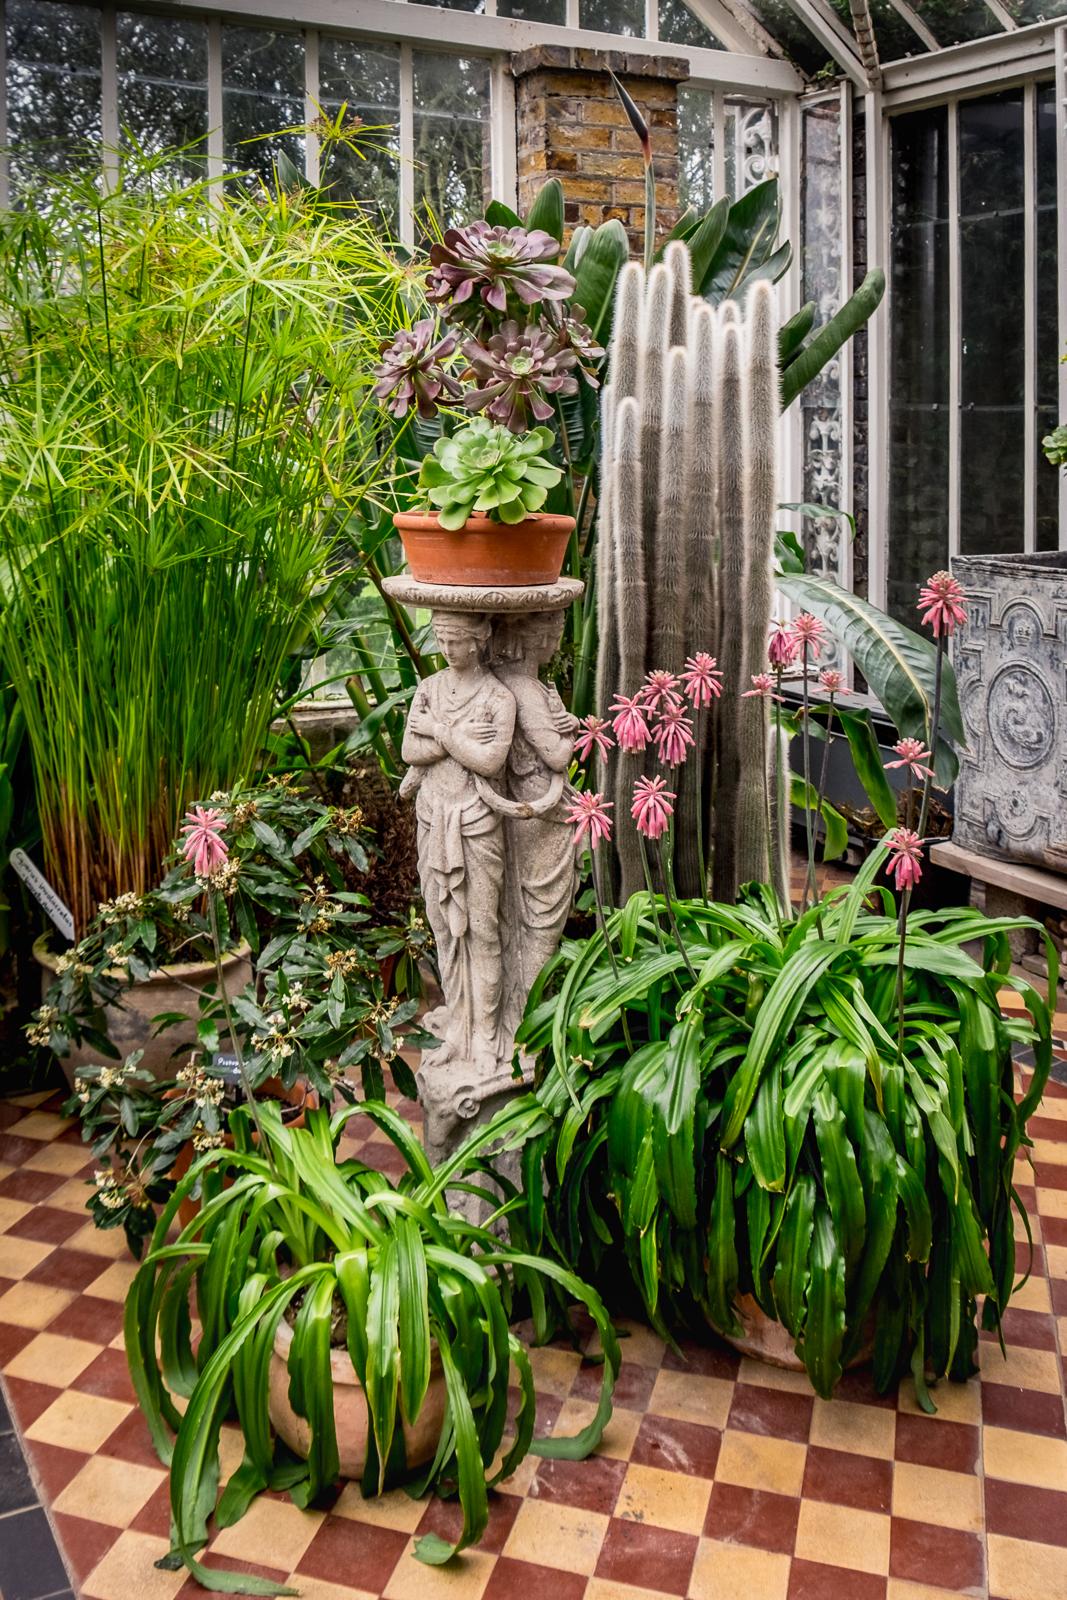 20170301_Enfield_Myddelton-House-Gardens_Hothouse